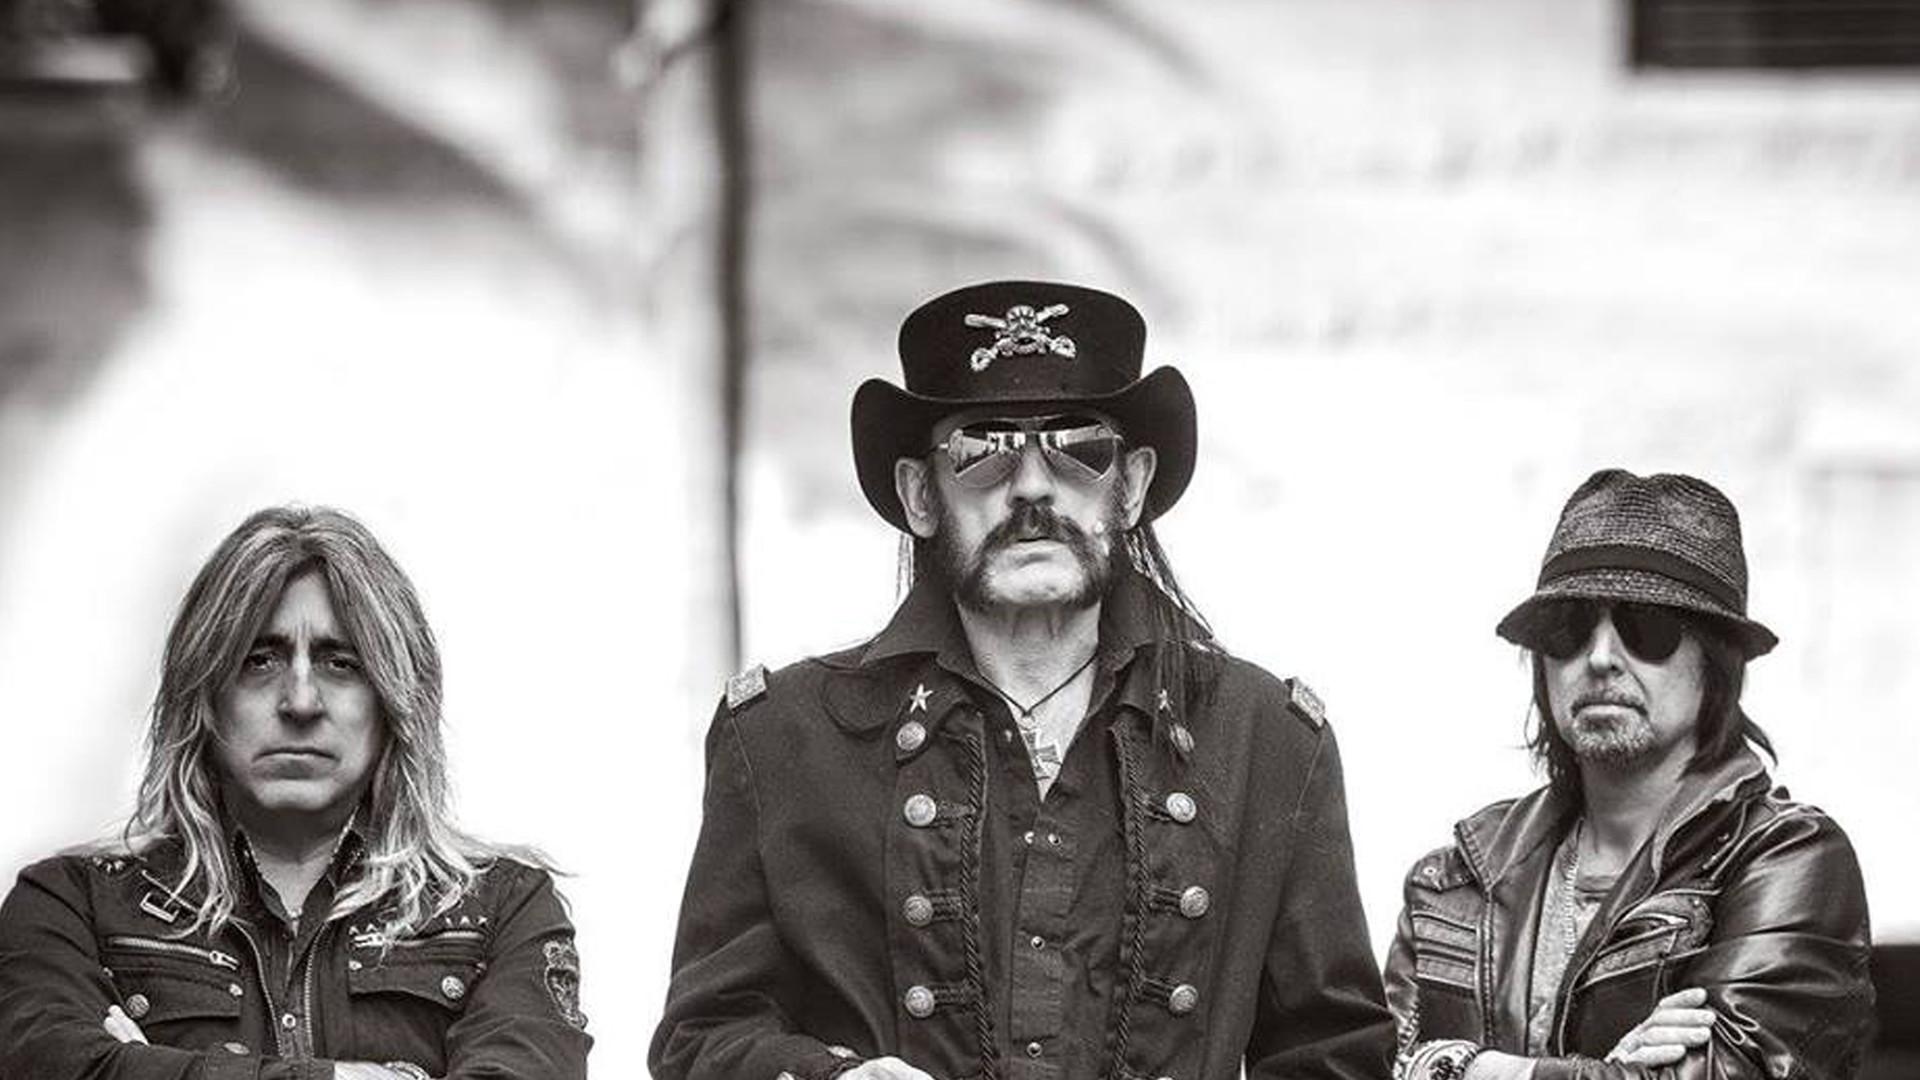 Lemmy Kilmister Rock Music Motorhead Wallpaper Hd: Lemmy Wallpaper (61+ Images